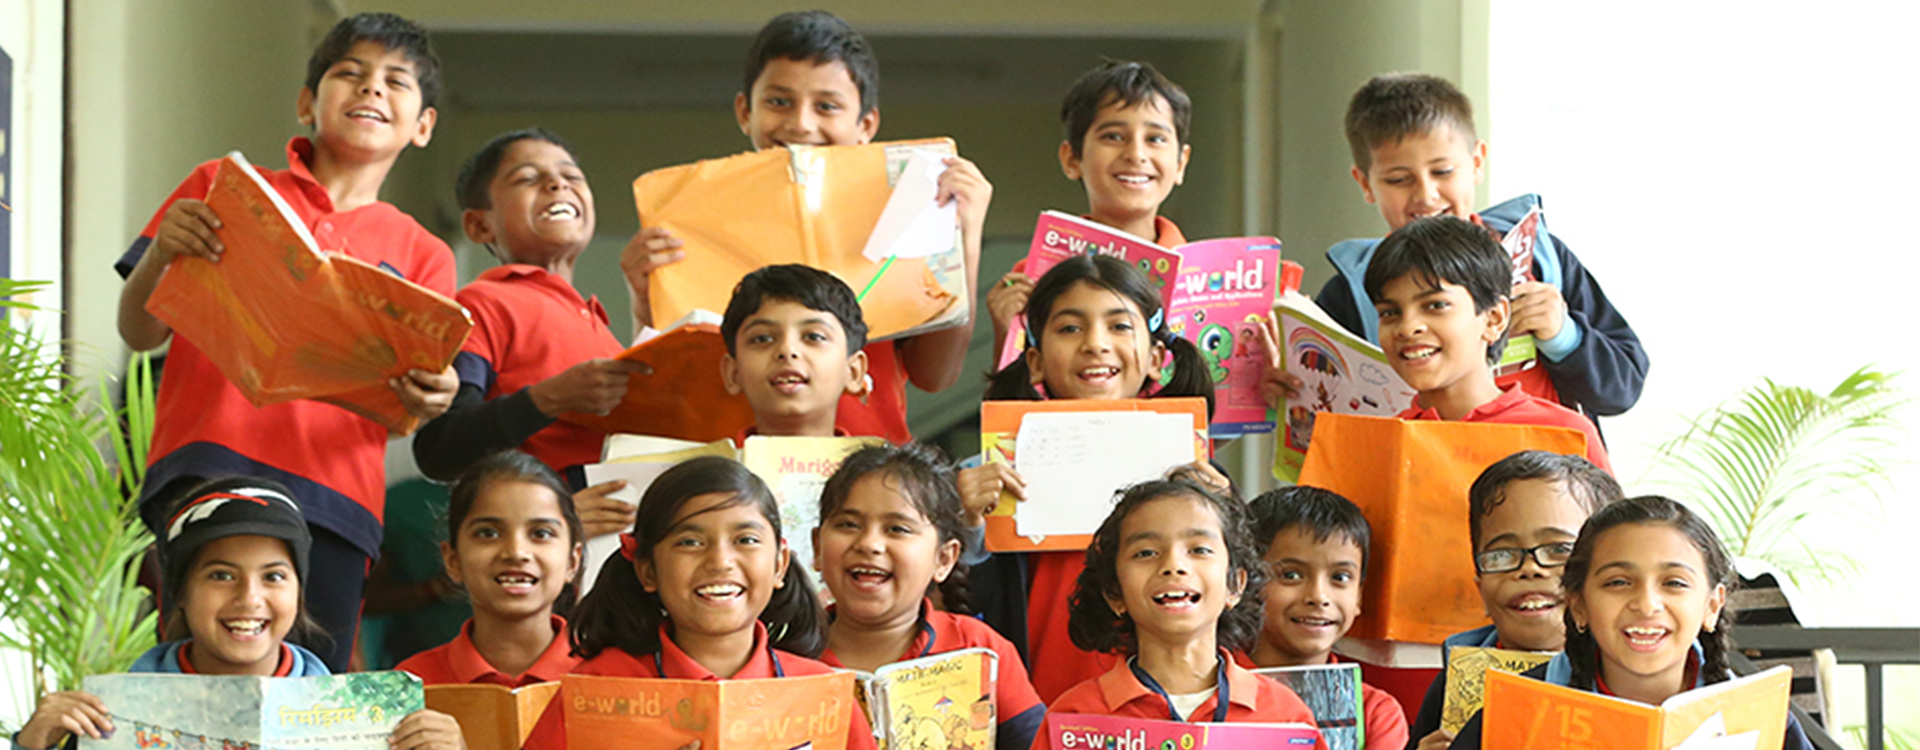 Academics || The Aarambh School